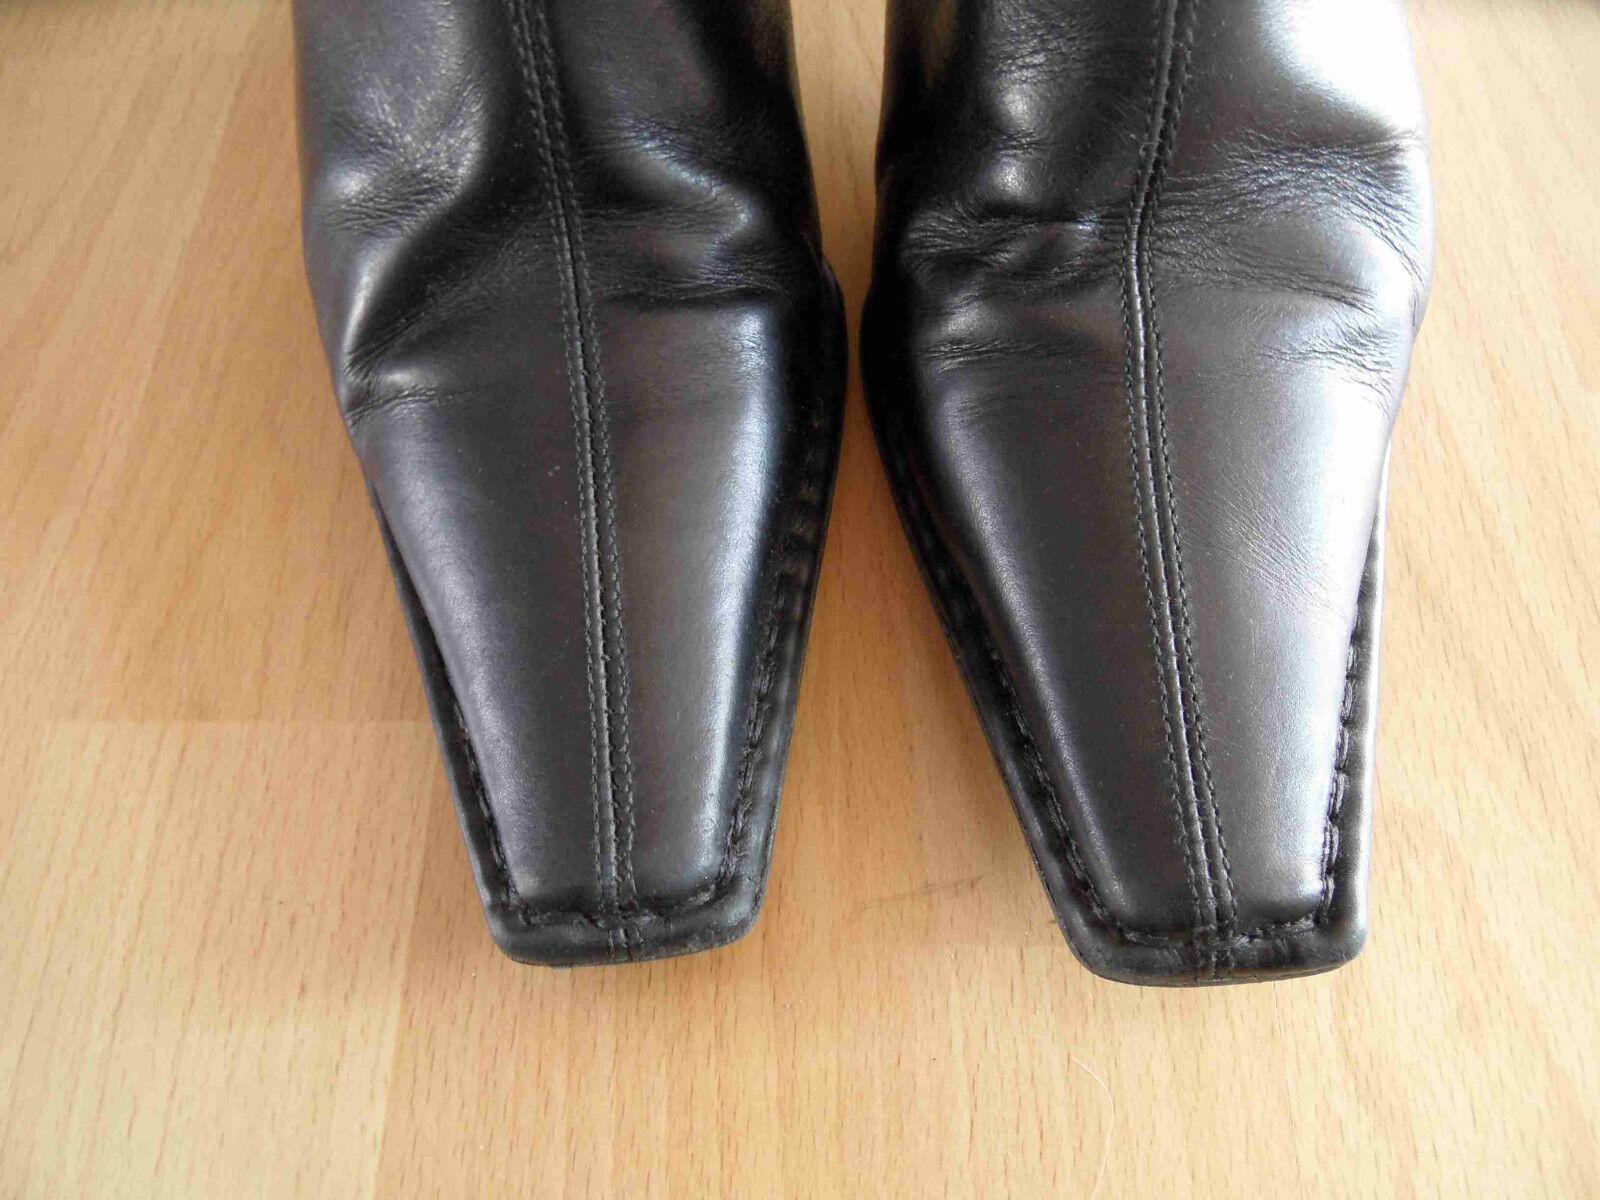 LAZZARINI chice gefütterte hohe TOP Stiefel schwarz Gr. 39 TOP hohe (VS 514) ce3928